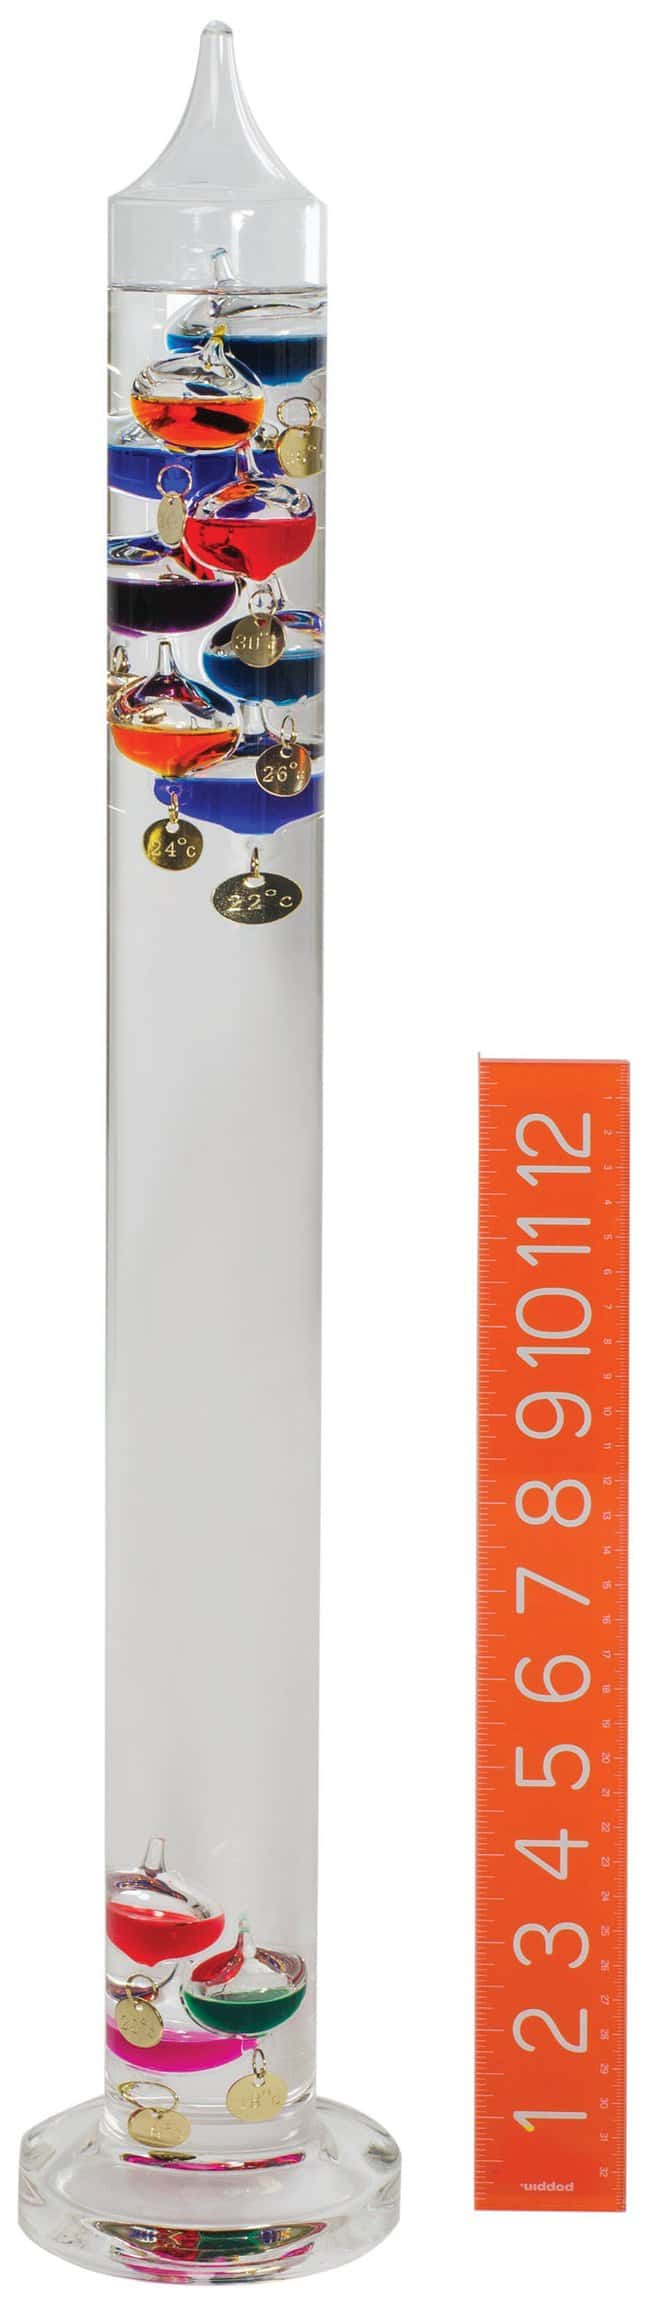 H-B Instrument™Durac™ Galileo Thermometers